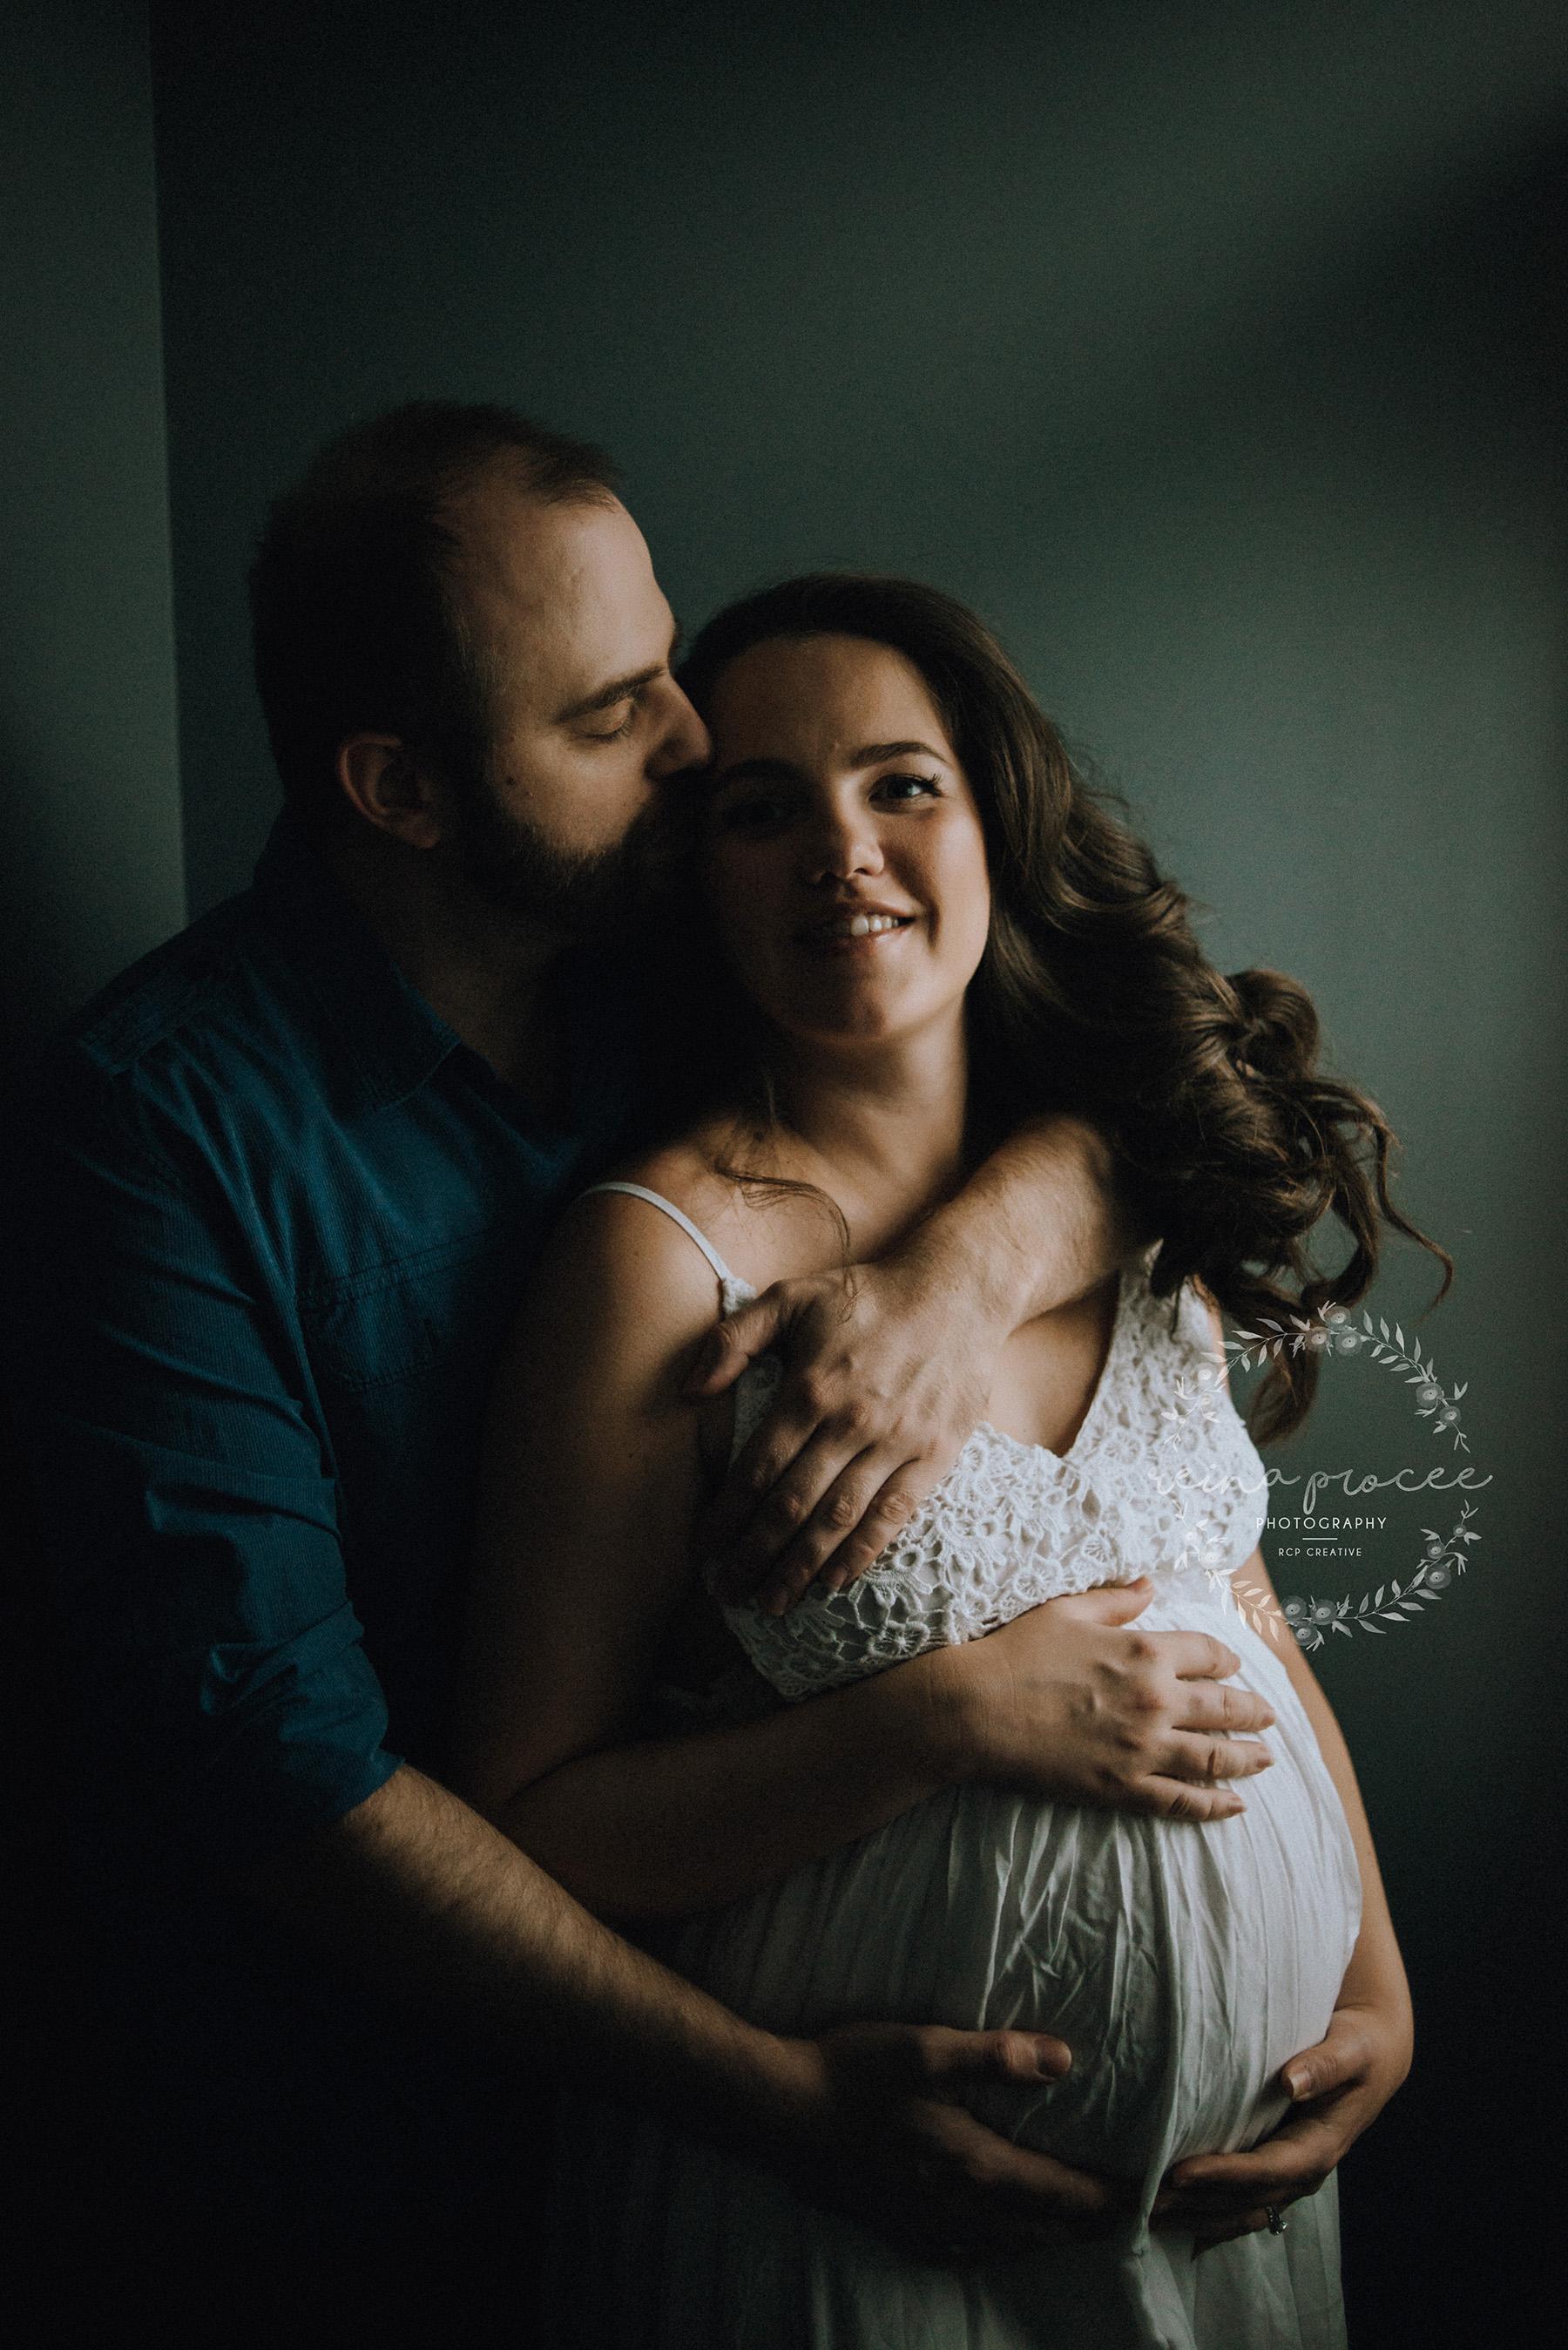 pregnancy-photo-session-montreal-14.jpg